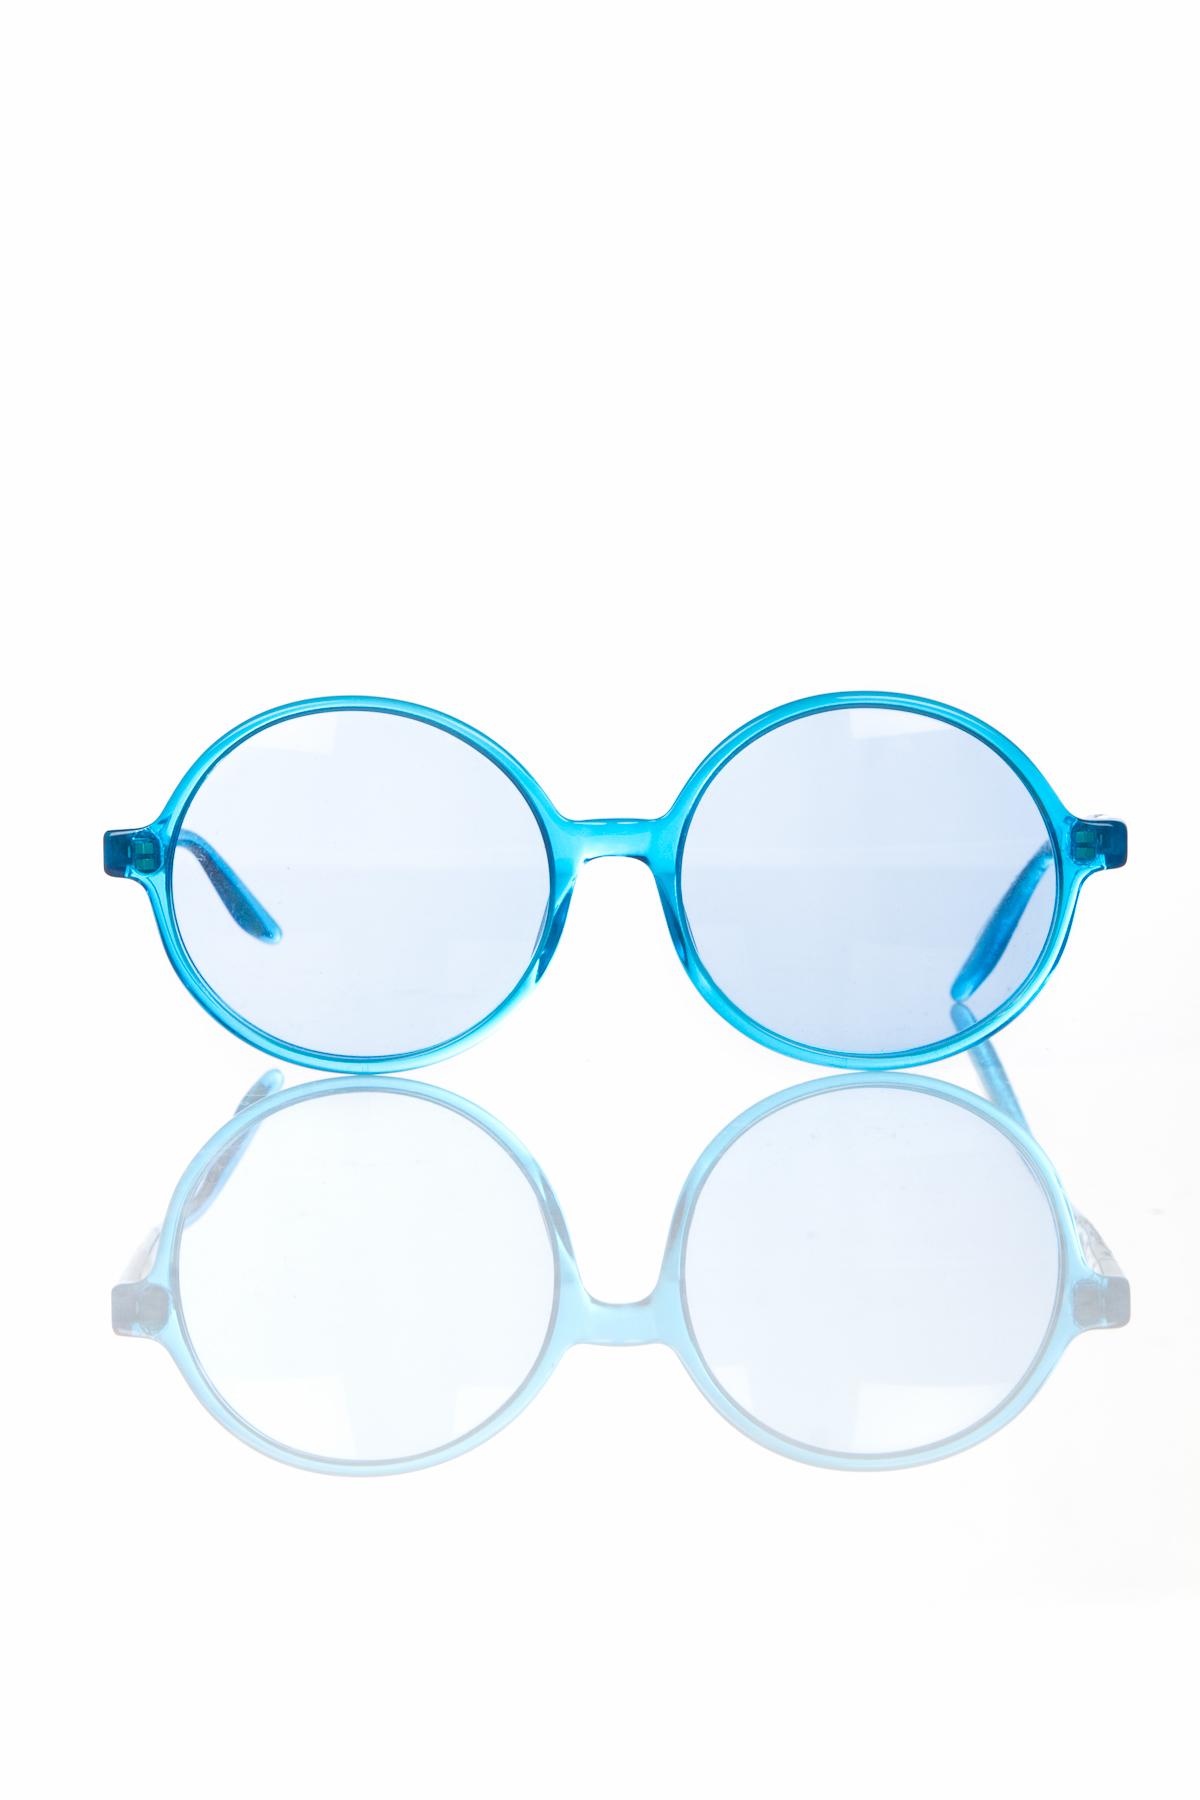 CHLOE SEVIGNY FOR OPENING CEREMONY BARTON PERREIRA JACKIE - BLUE W/BLUE LENS - WOMEN